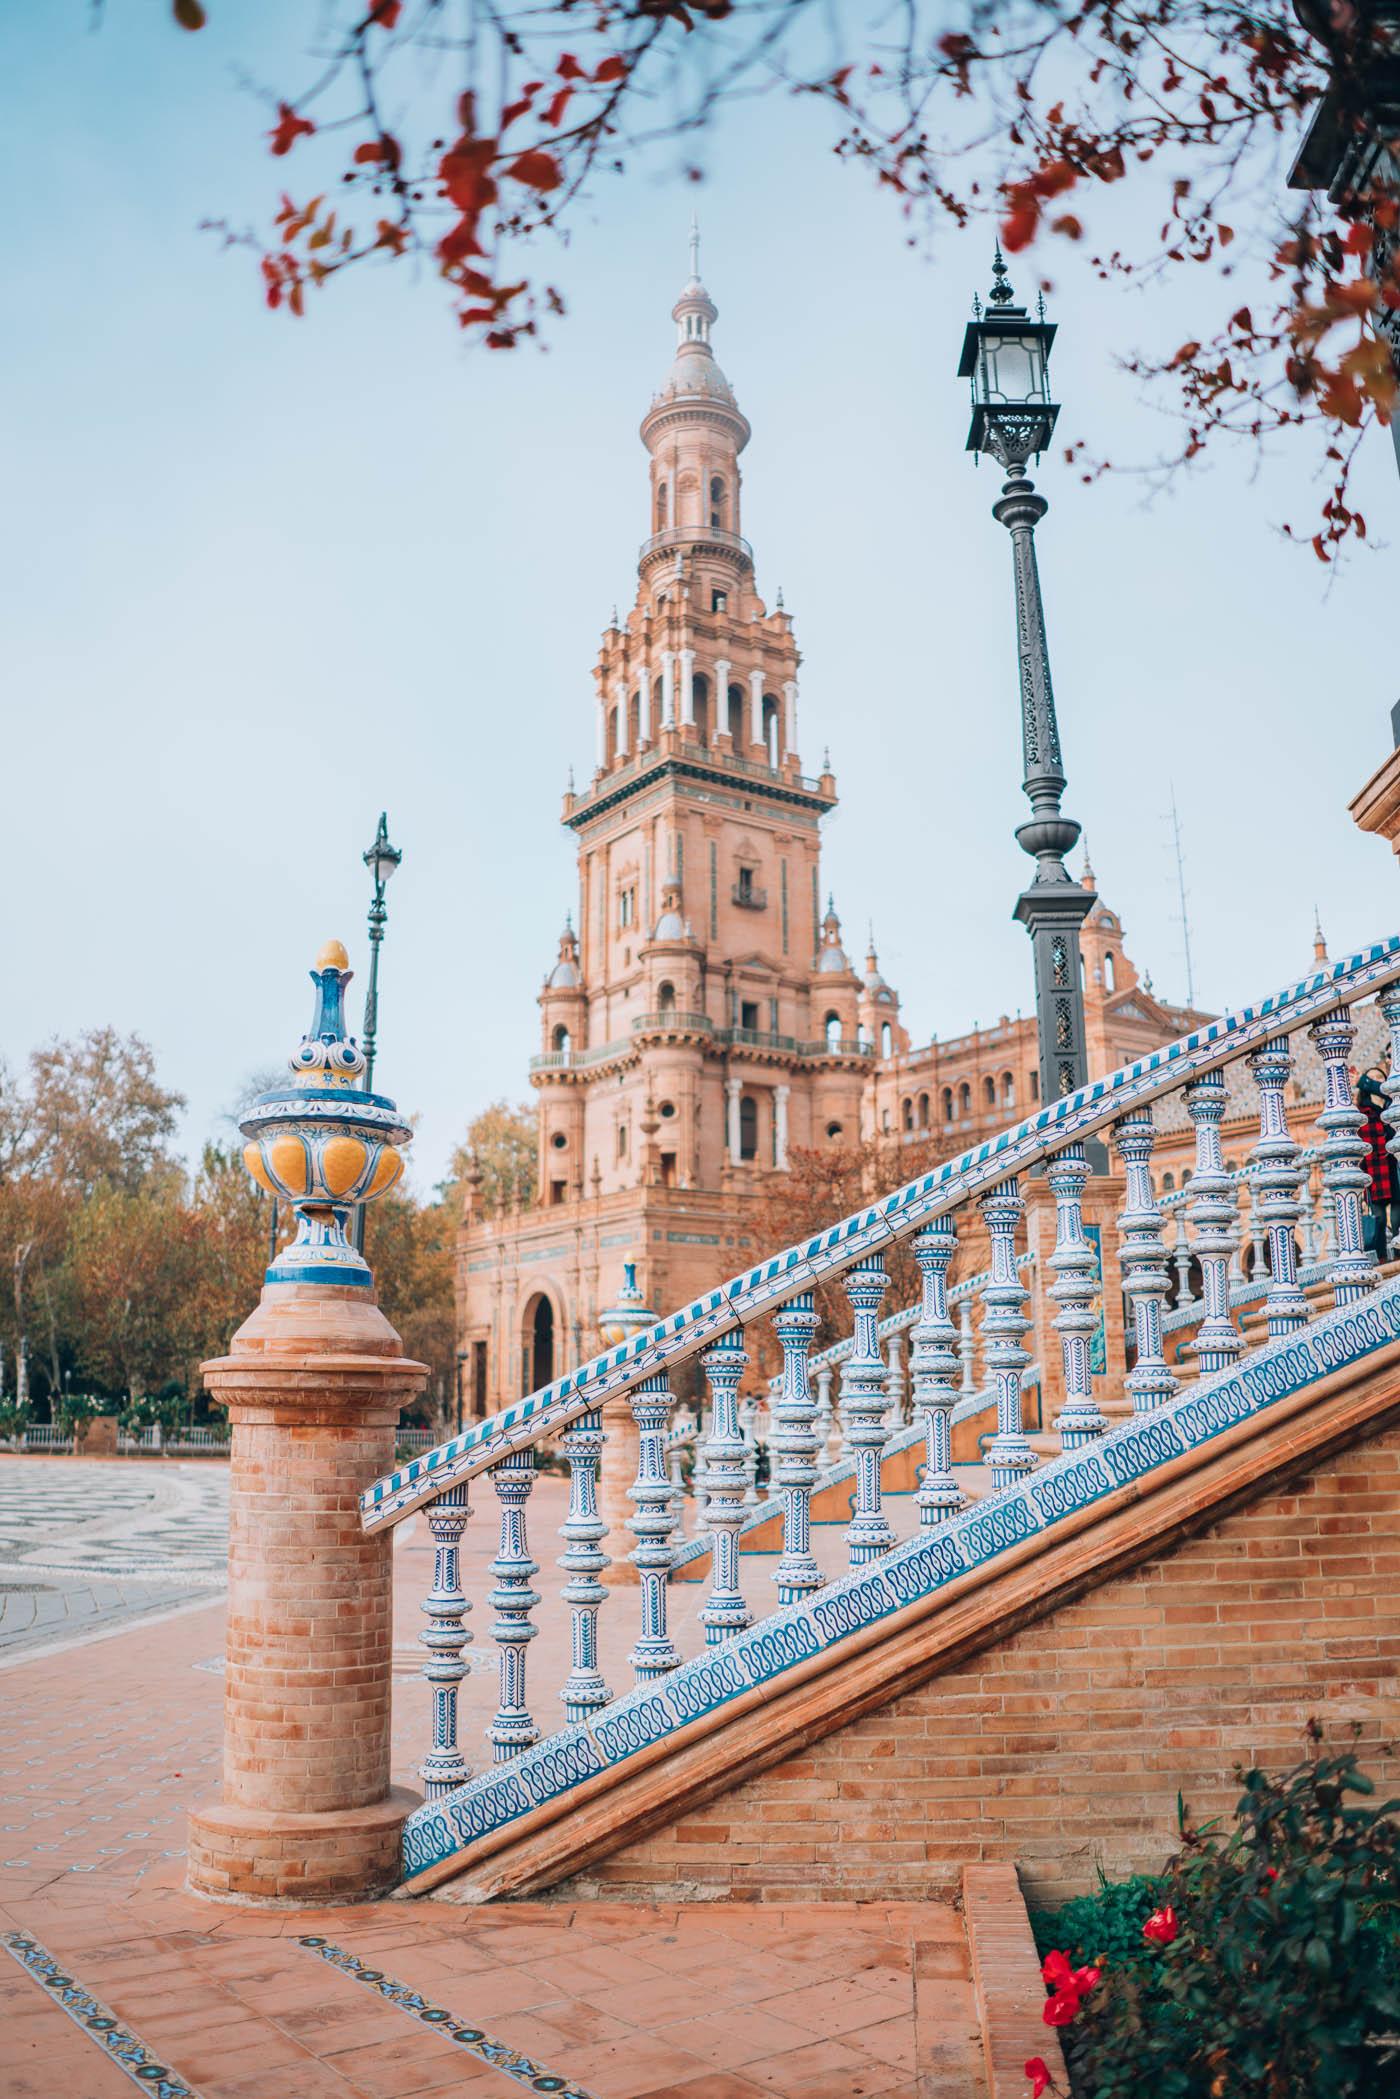 48 Hours in Seville